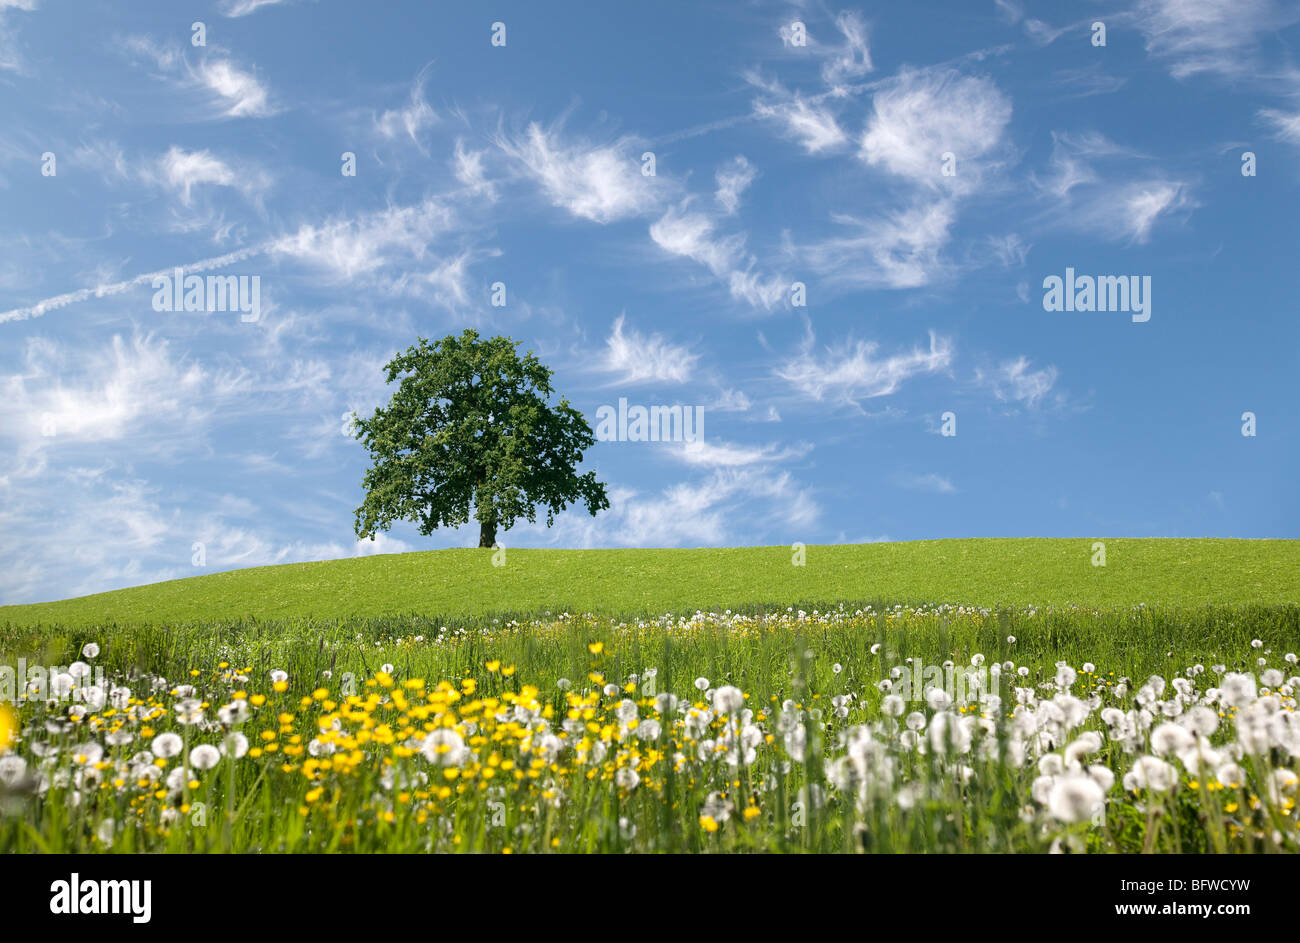 oak tree on hill in spring - Stock Image